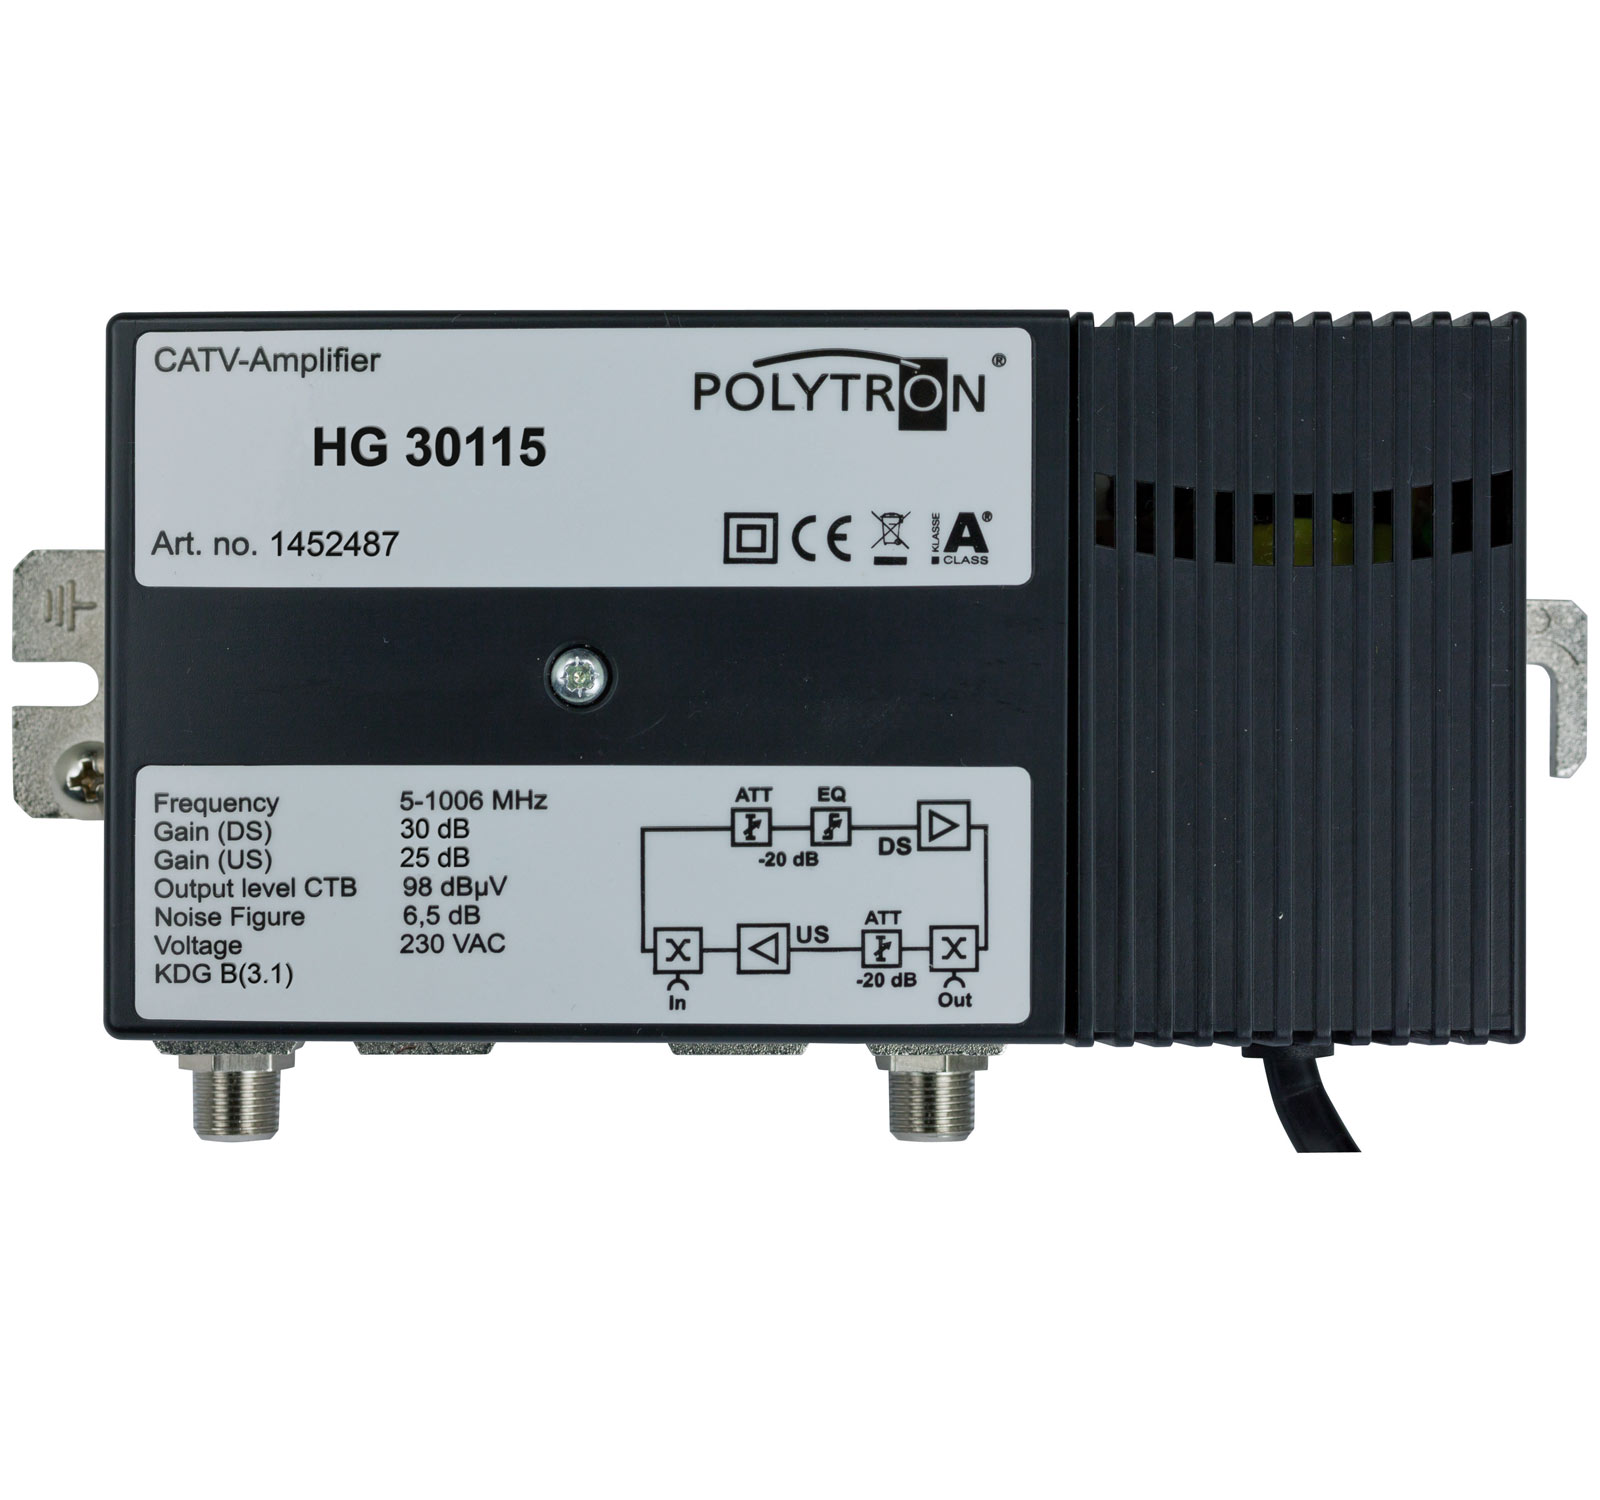 HG 30115 Κεντρικός Ενισχυτής 30dB,115dBμV,25dB POLYTRON